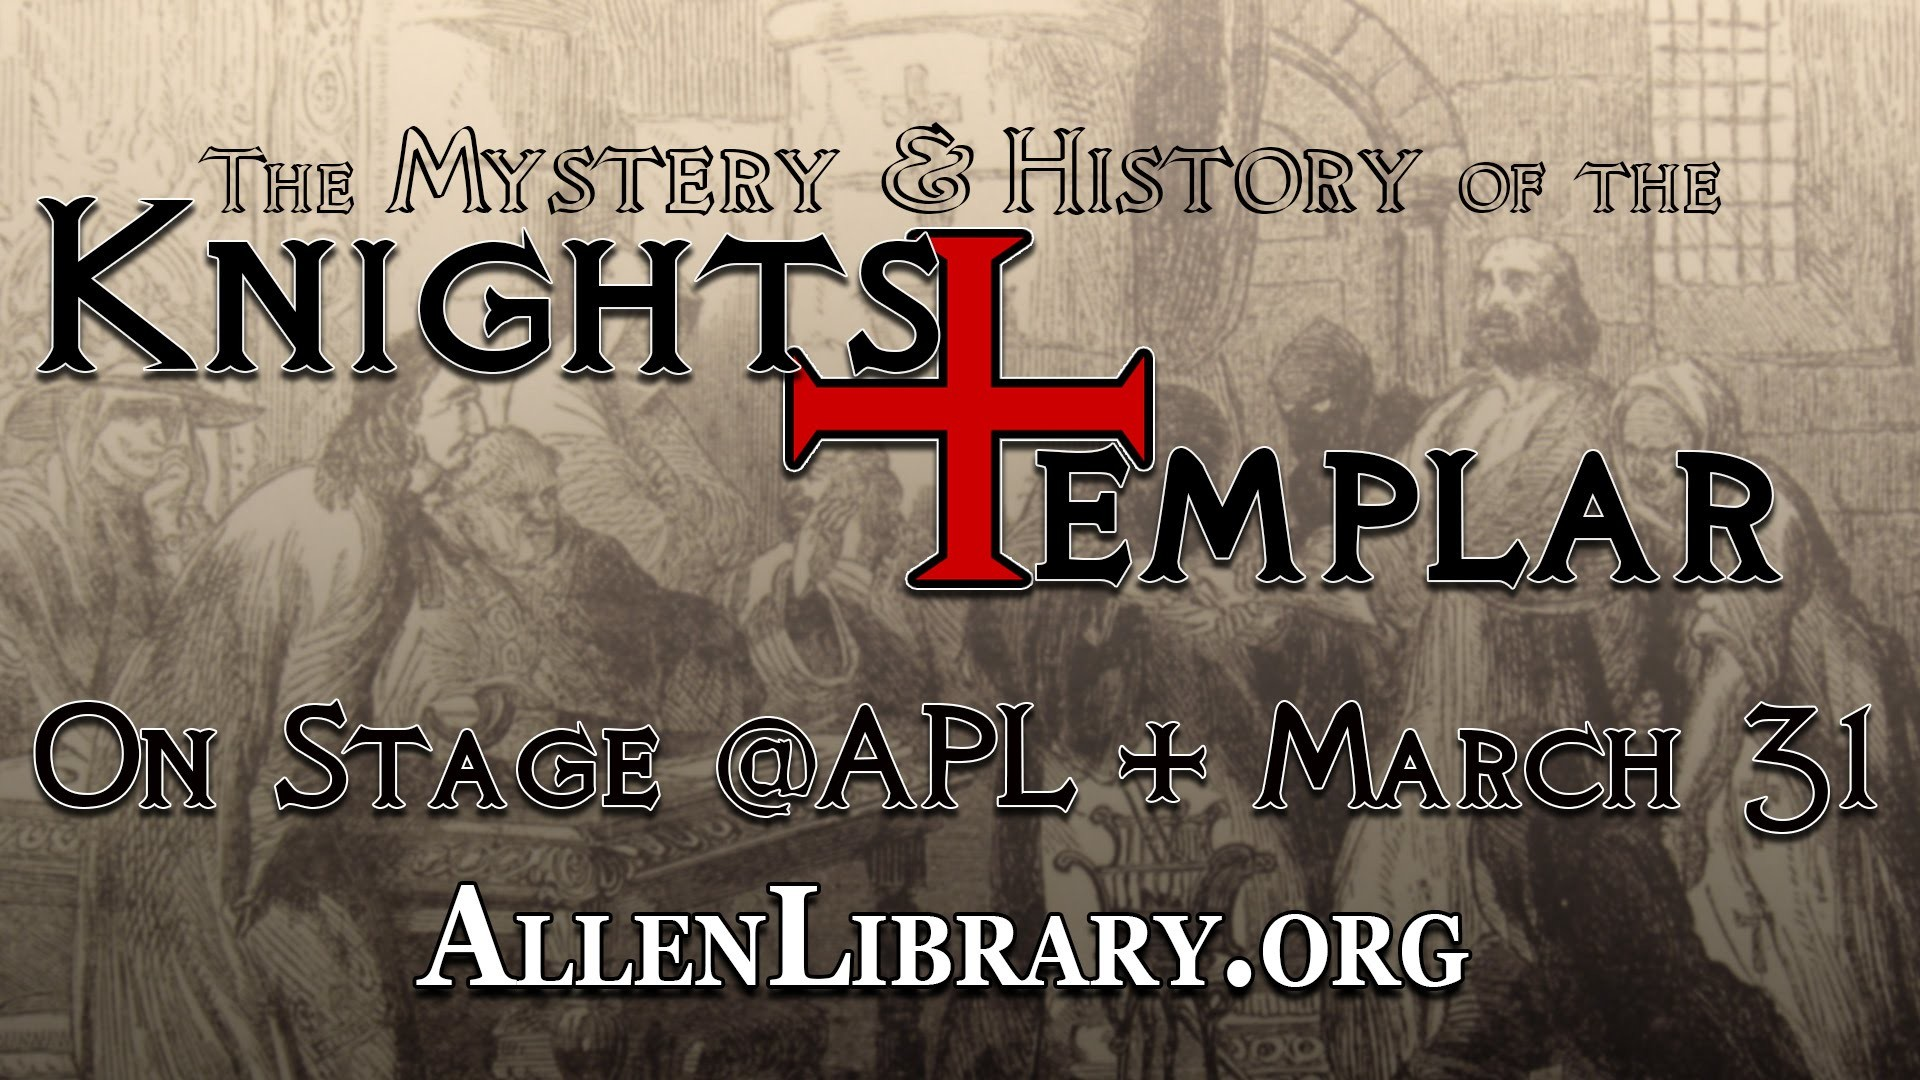 Res: 1920x1080, Mystery & History : Knights Templar